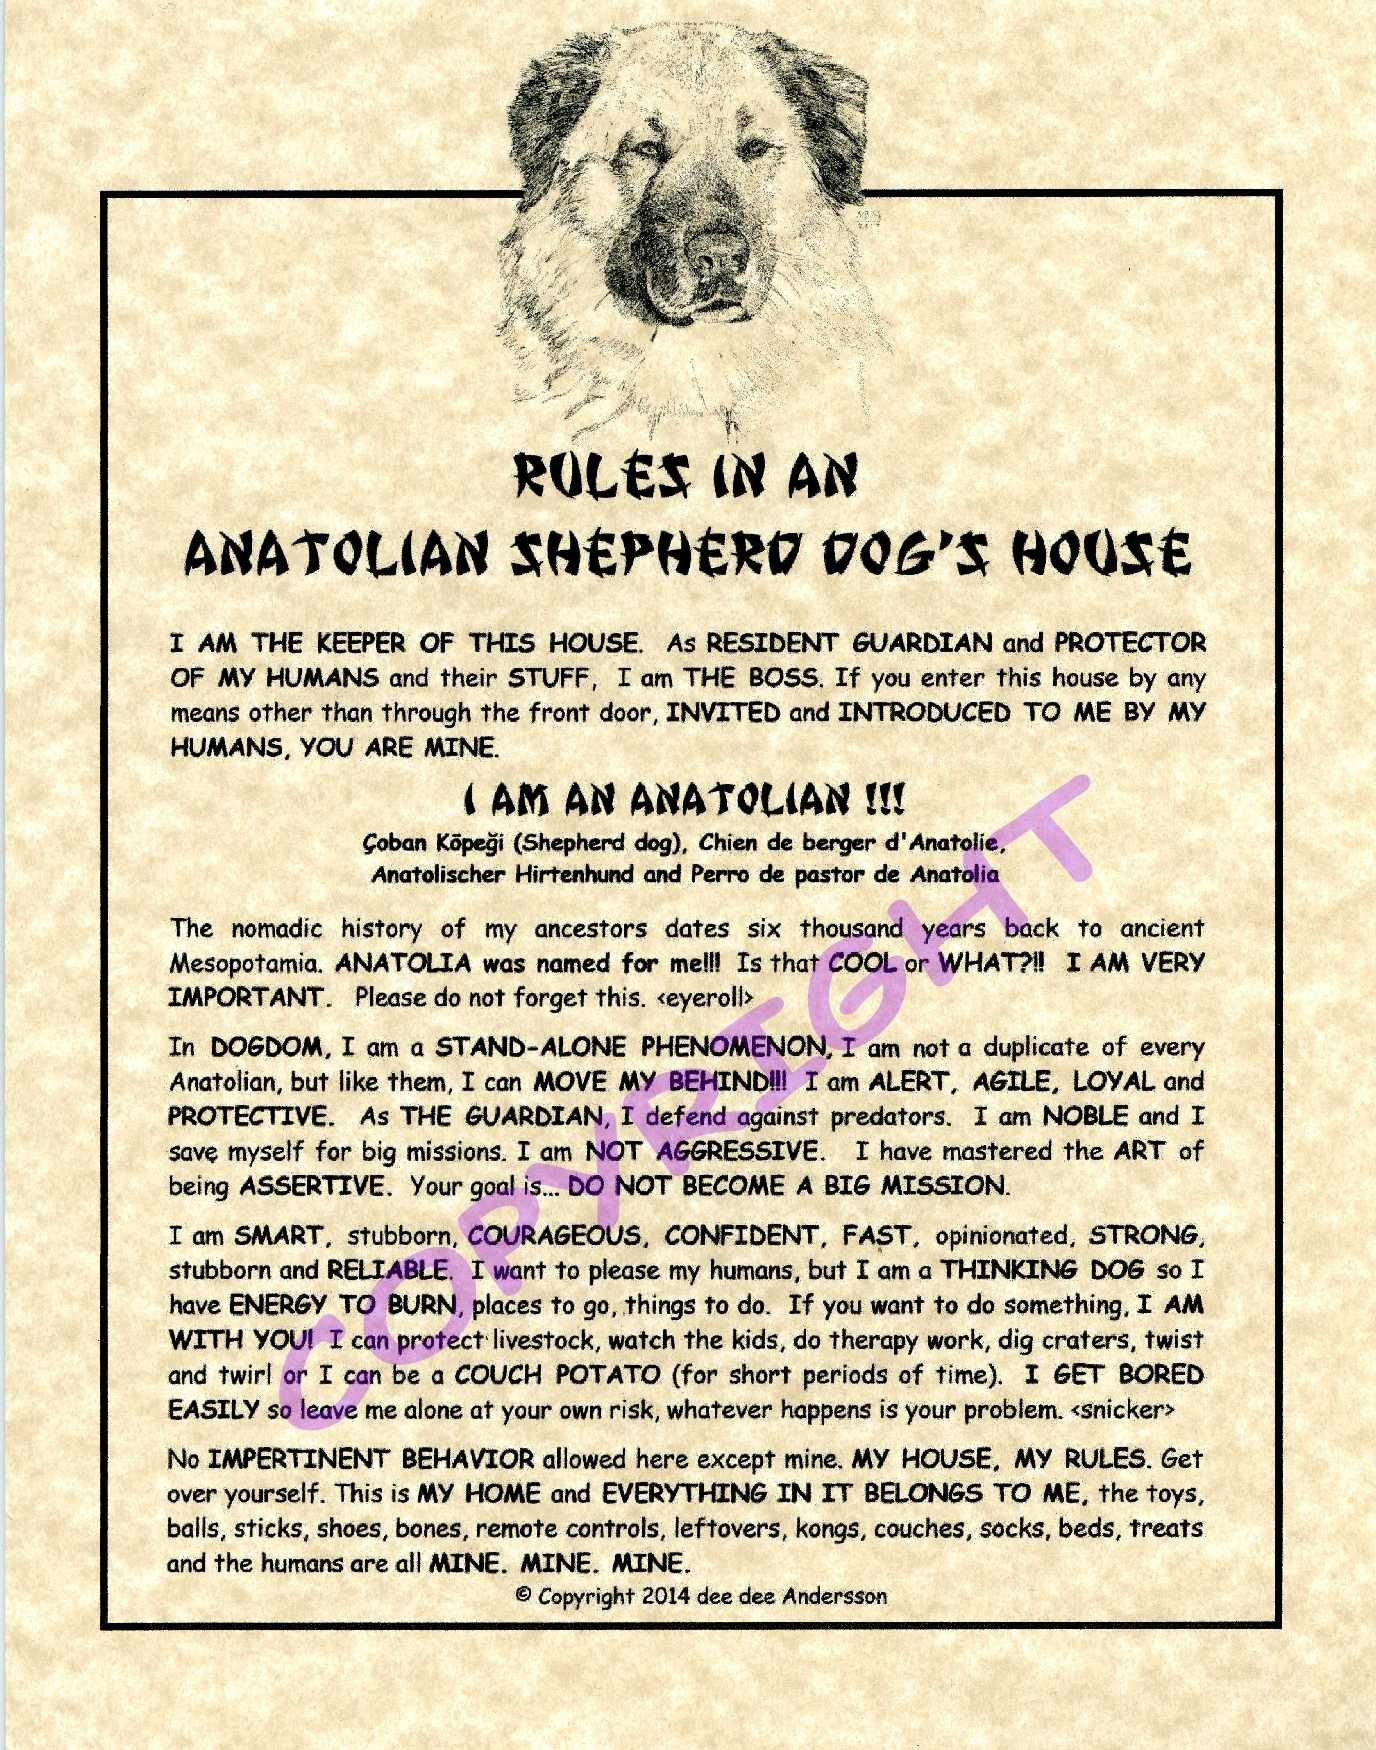 Rules In An Anatolian Shepherd Dog HOuse 1